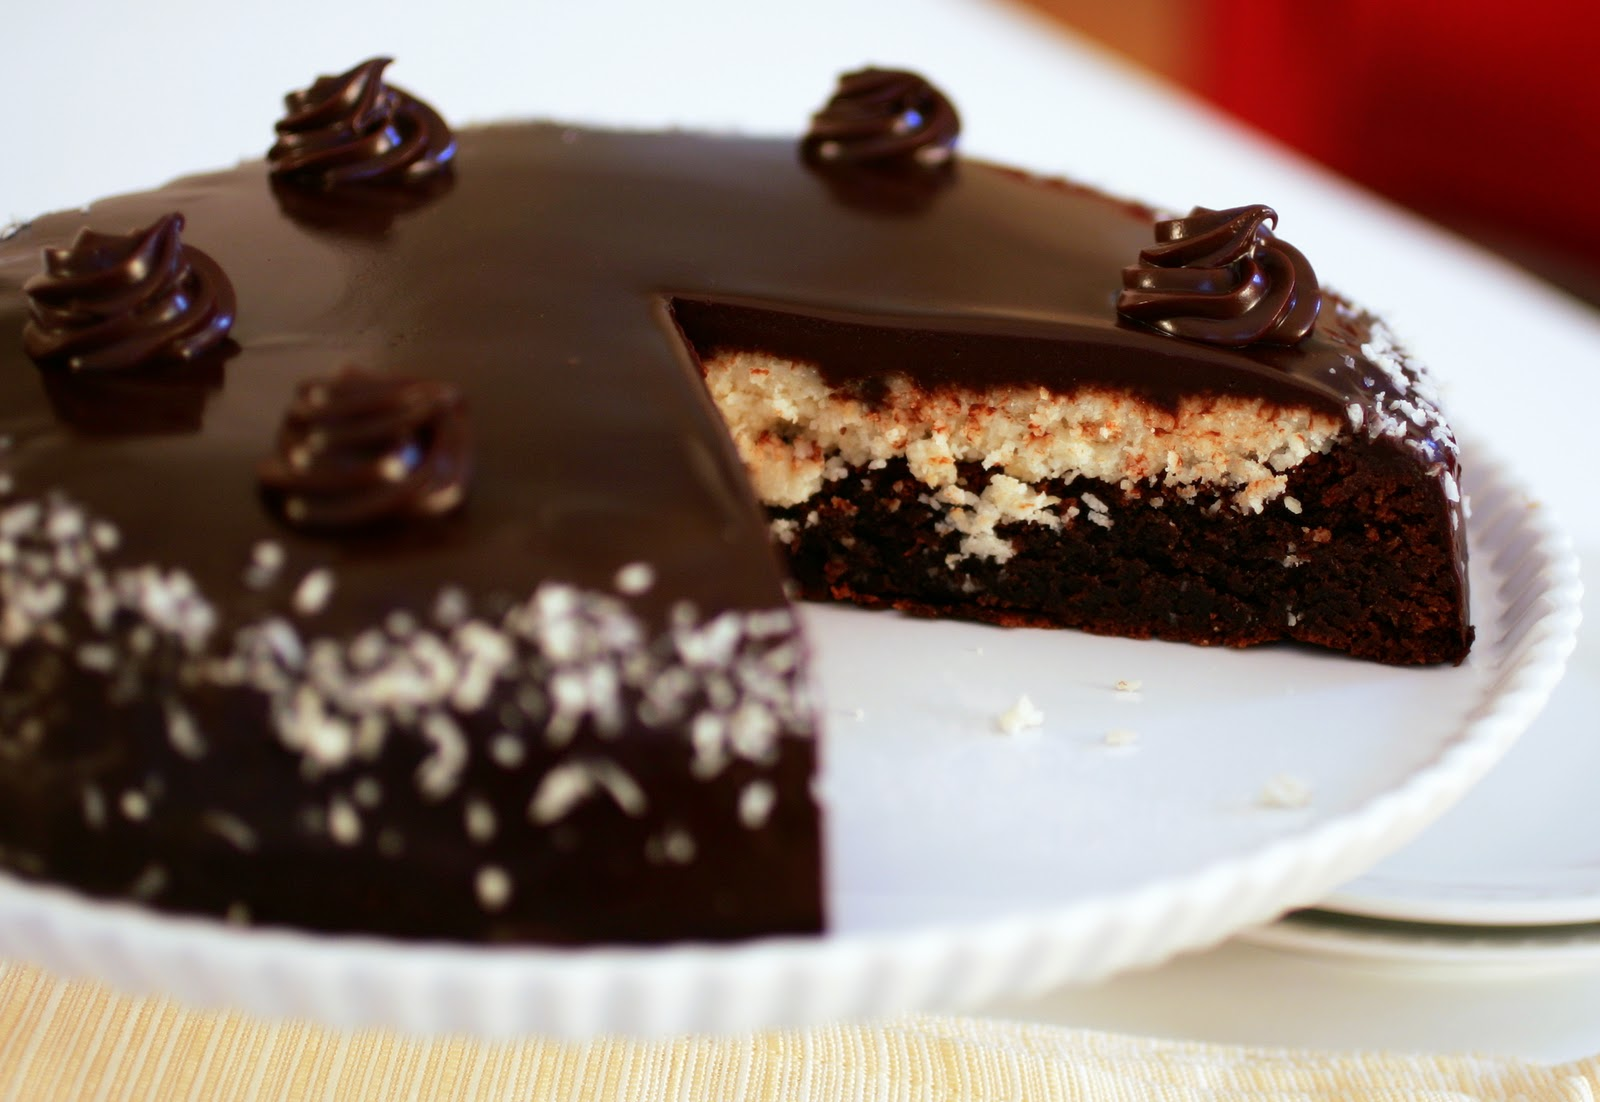 Chocolate Cake Made With Coconut Flour